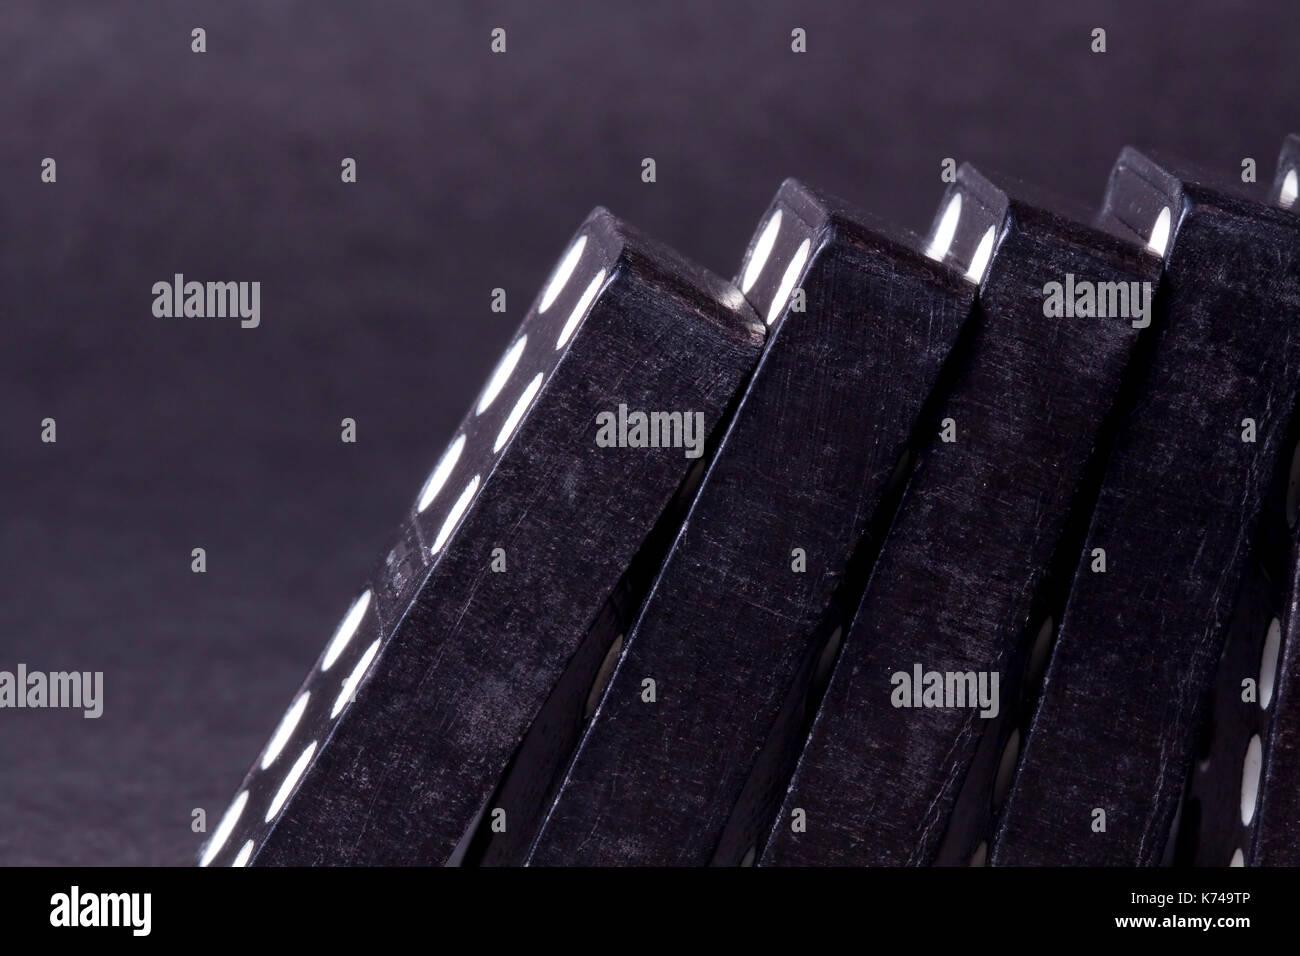 Black Dominos Toppled Over Stock Photo